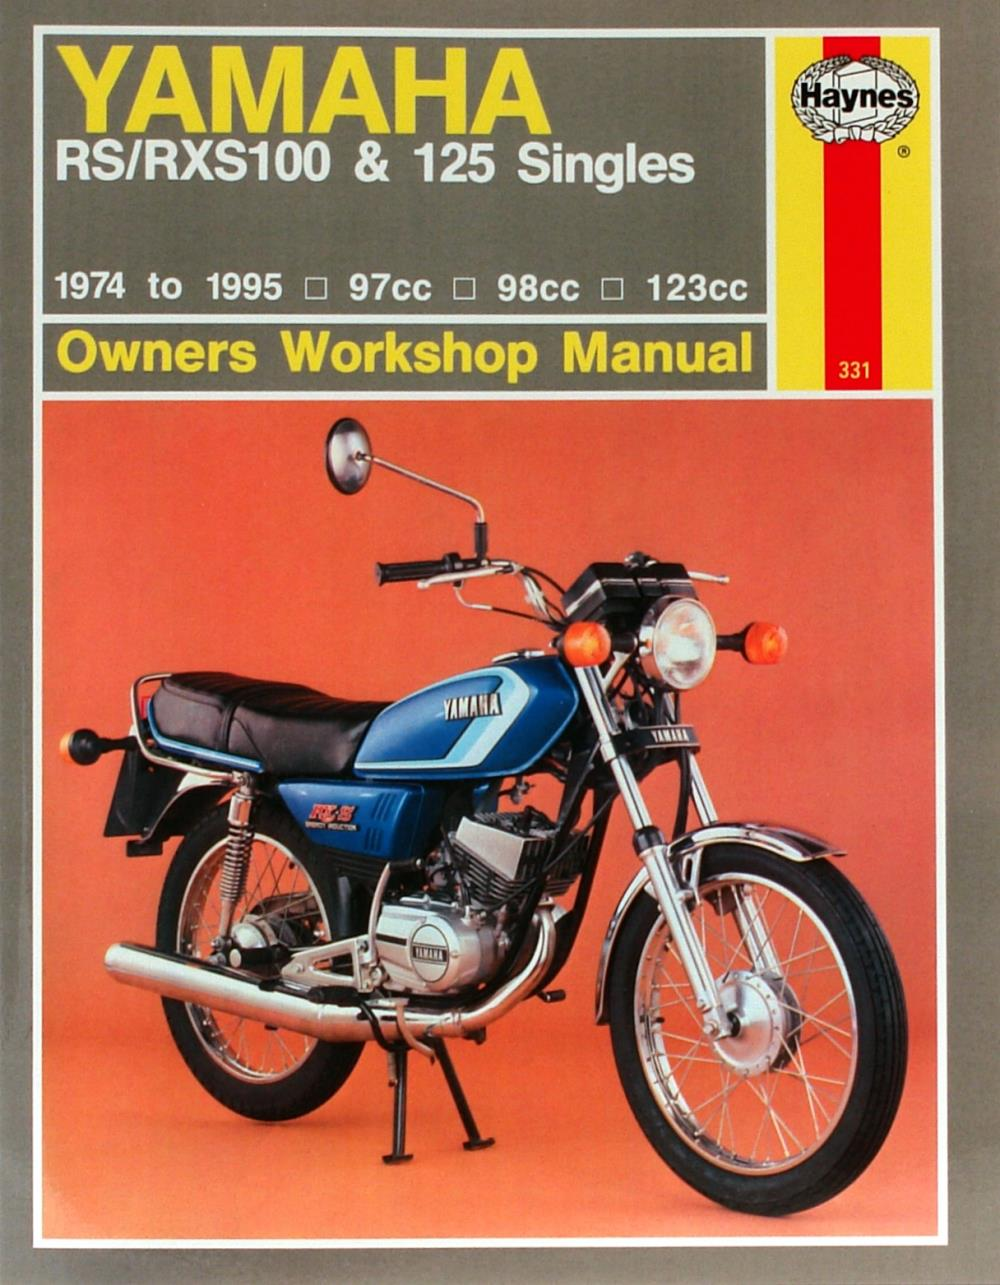 Yamaha Rs 100 Wiring Diagram Essig Tank Motorcycle Manual Haynes For 1977 Dx Disc Ebay